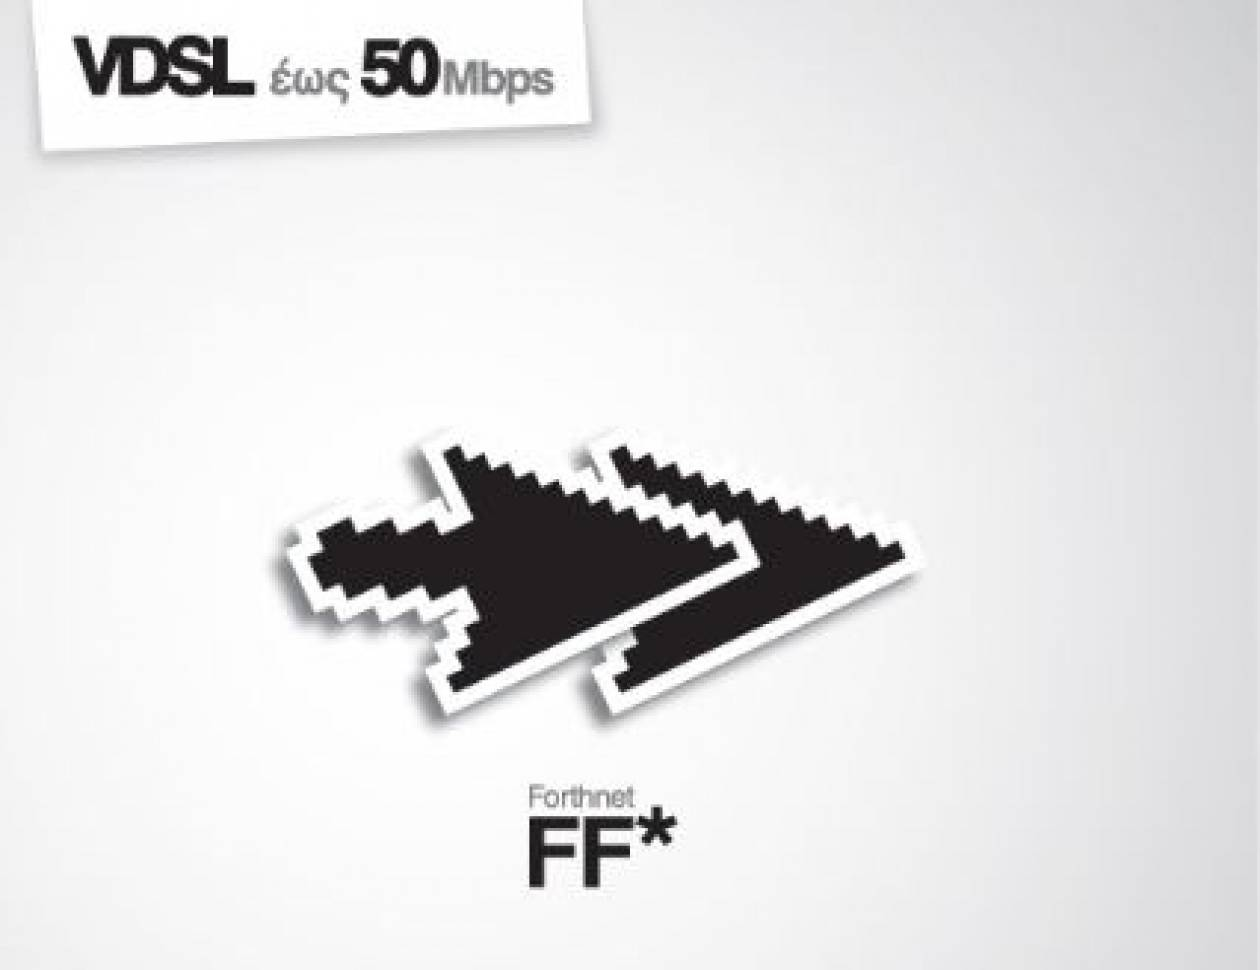 Forthnet ADSL με 17,90€  & Forthnet 2play Economy με 24,90€